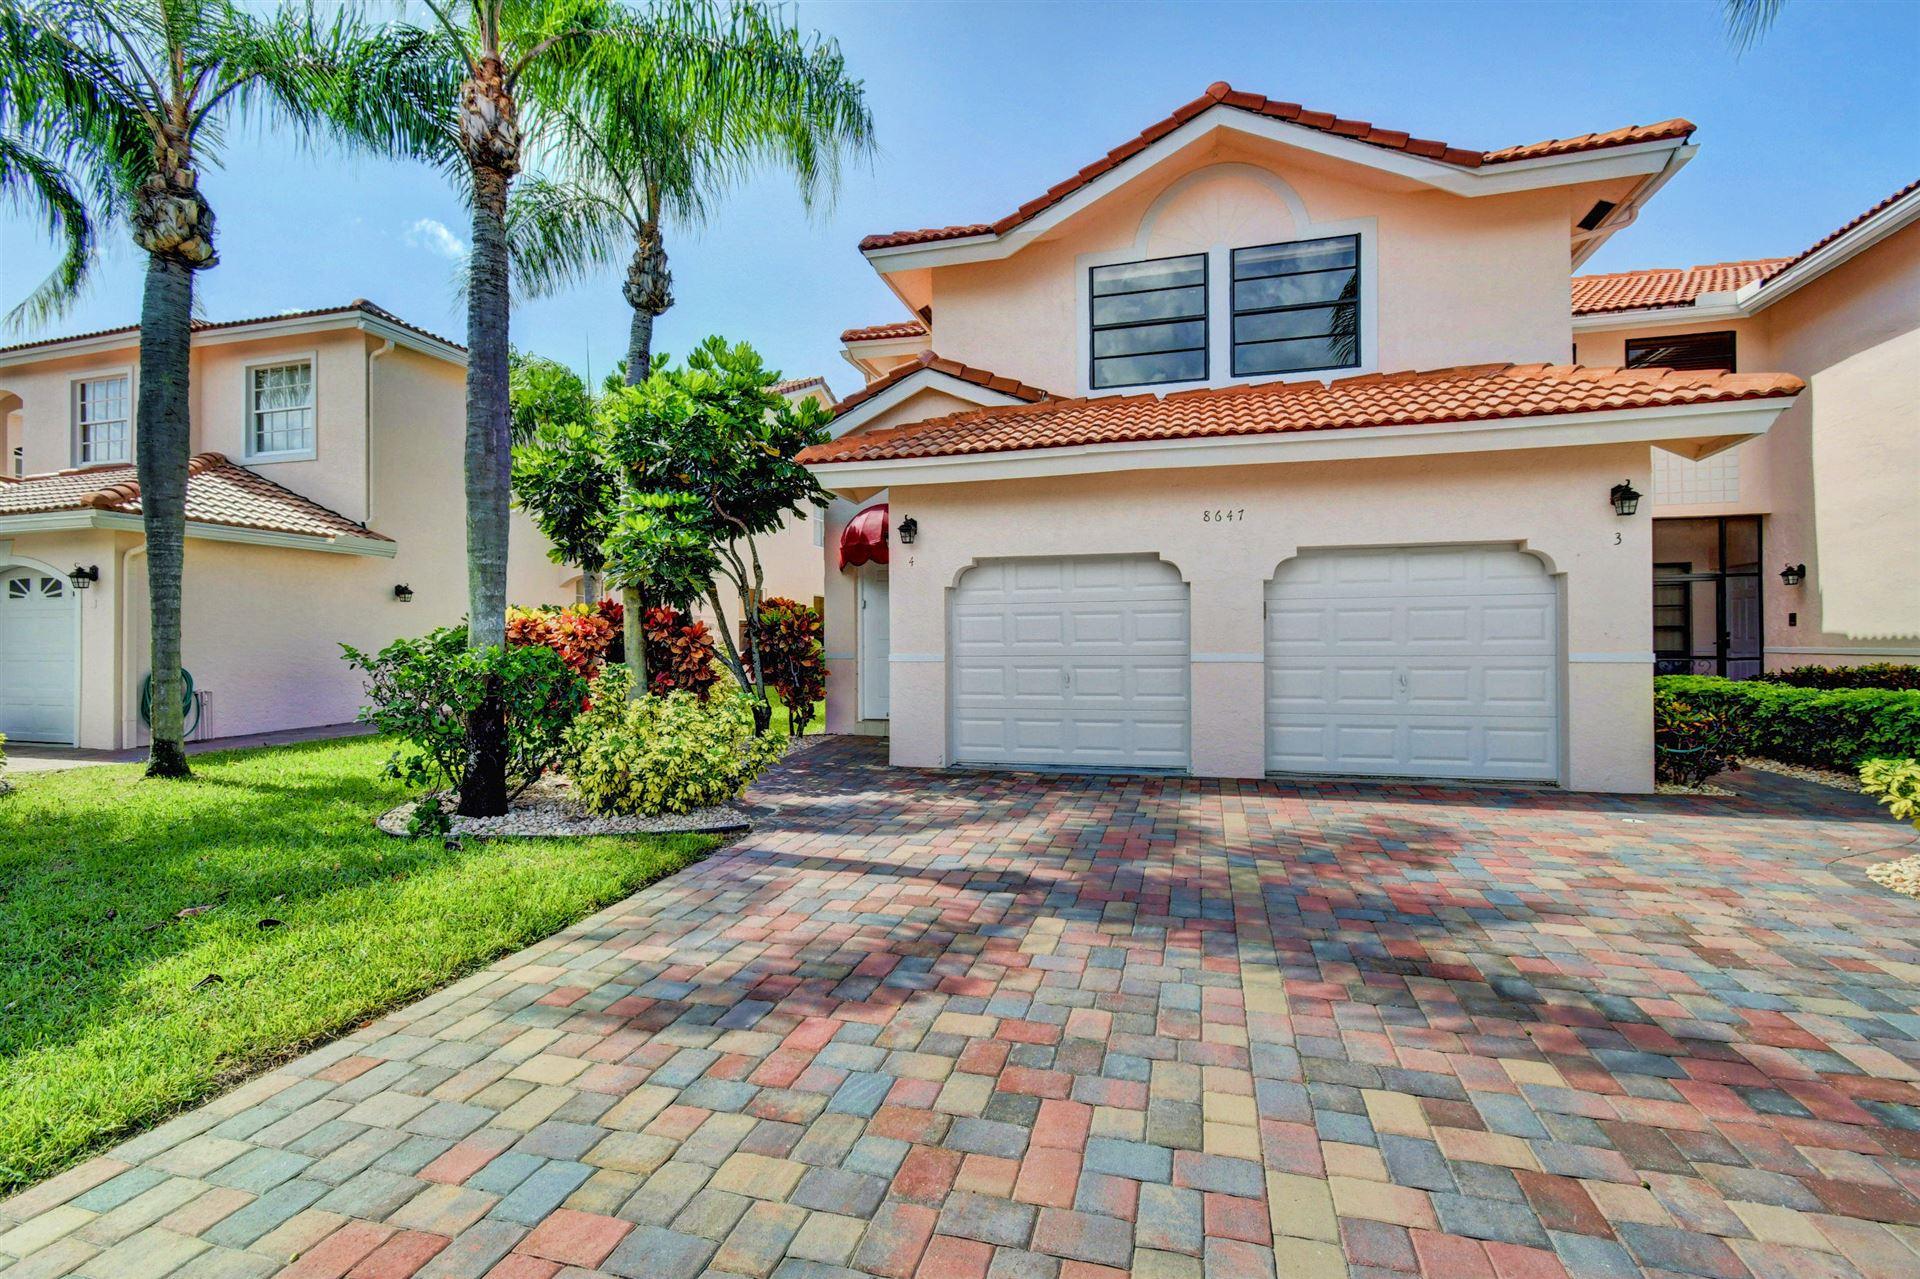 8647 Via Reale #4, Boca Raton, FL 33496 - #: RX-10635775